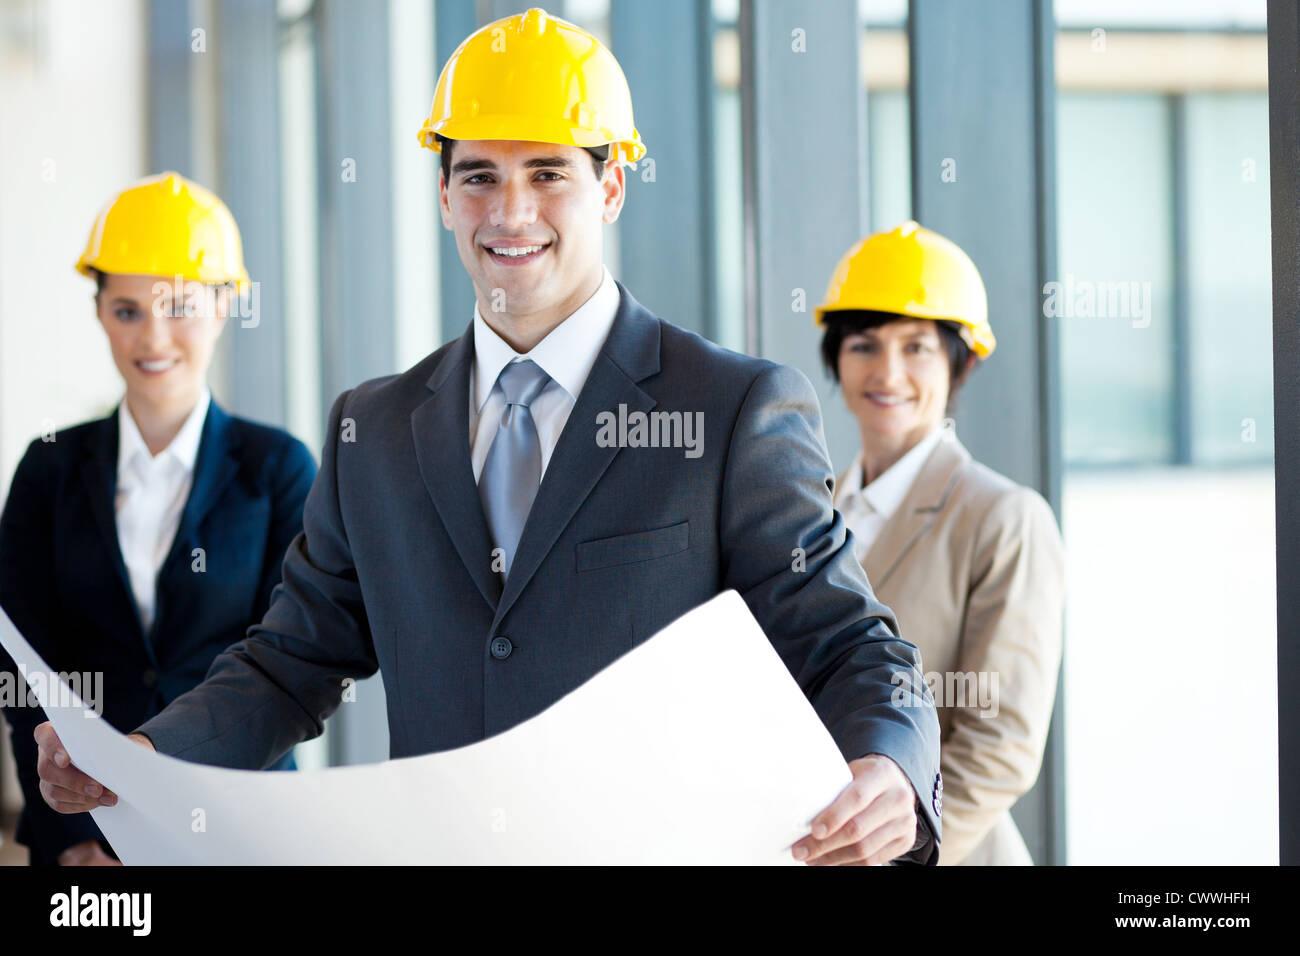 group of architects portrait - Stock Image